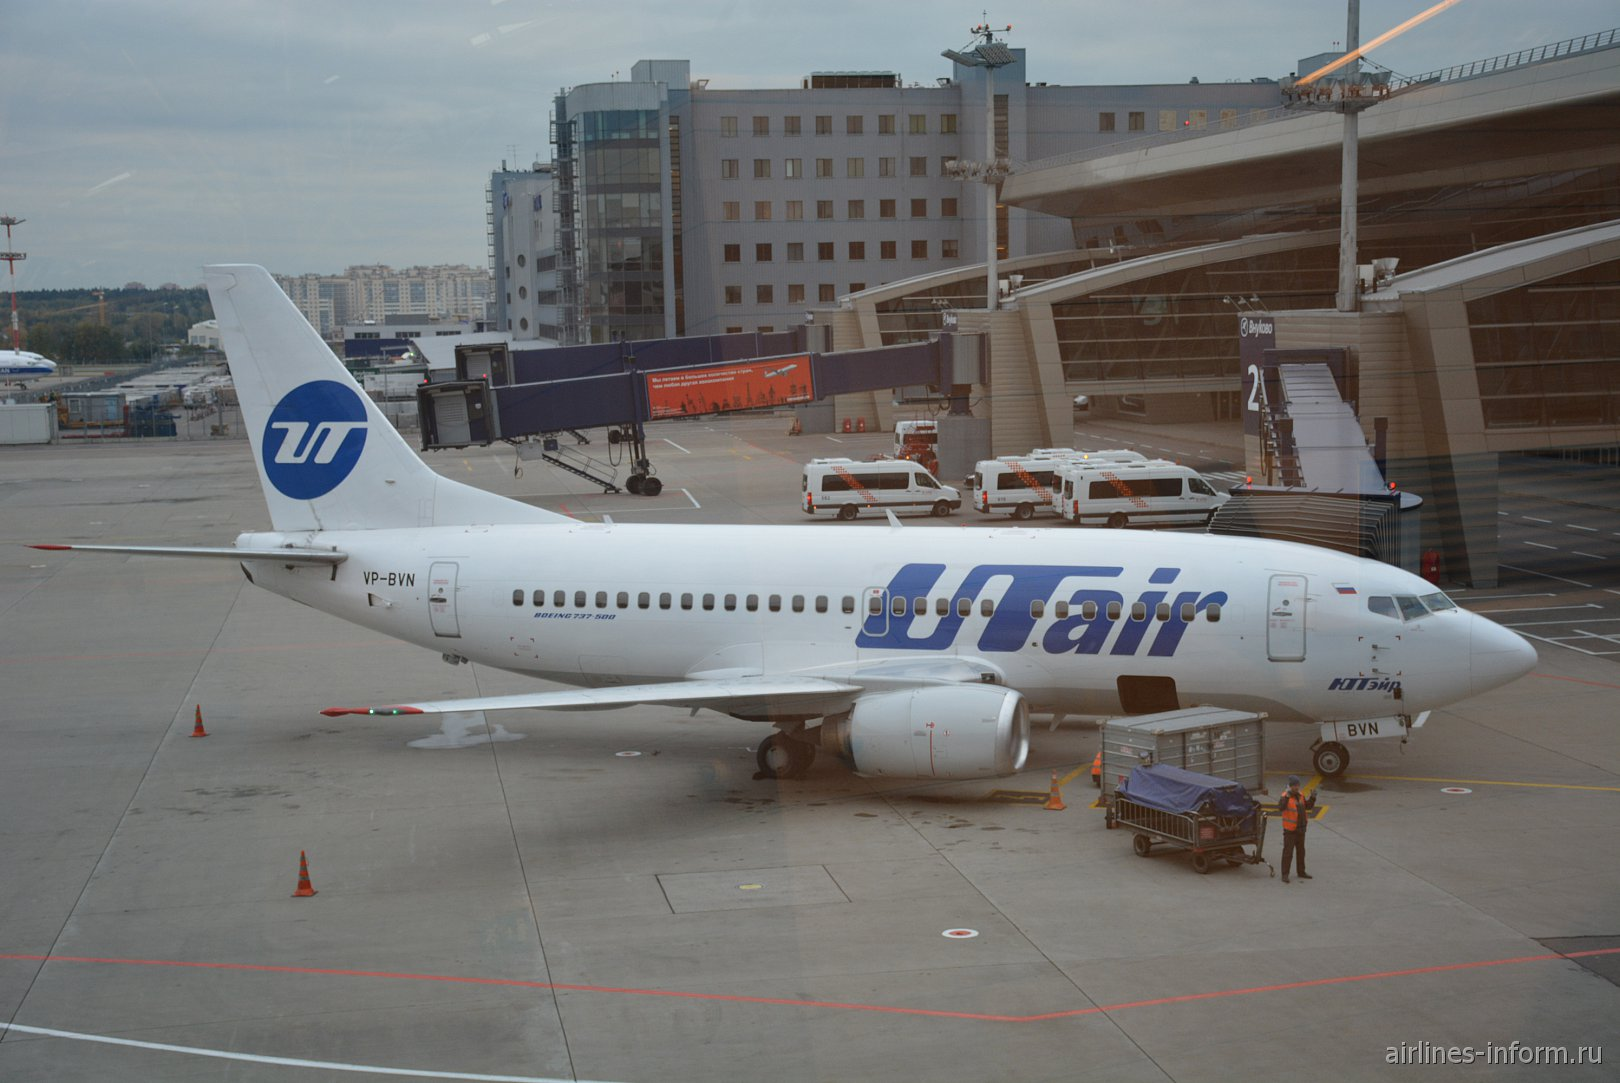 Боинг-737-500 VP-BVN авиакомпании UTair в аэропорту Внуково